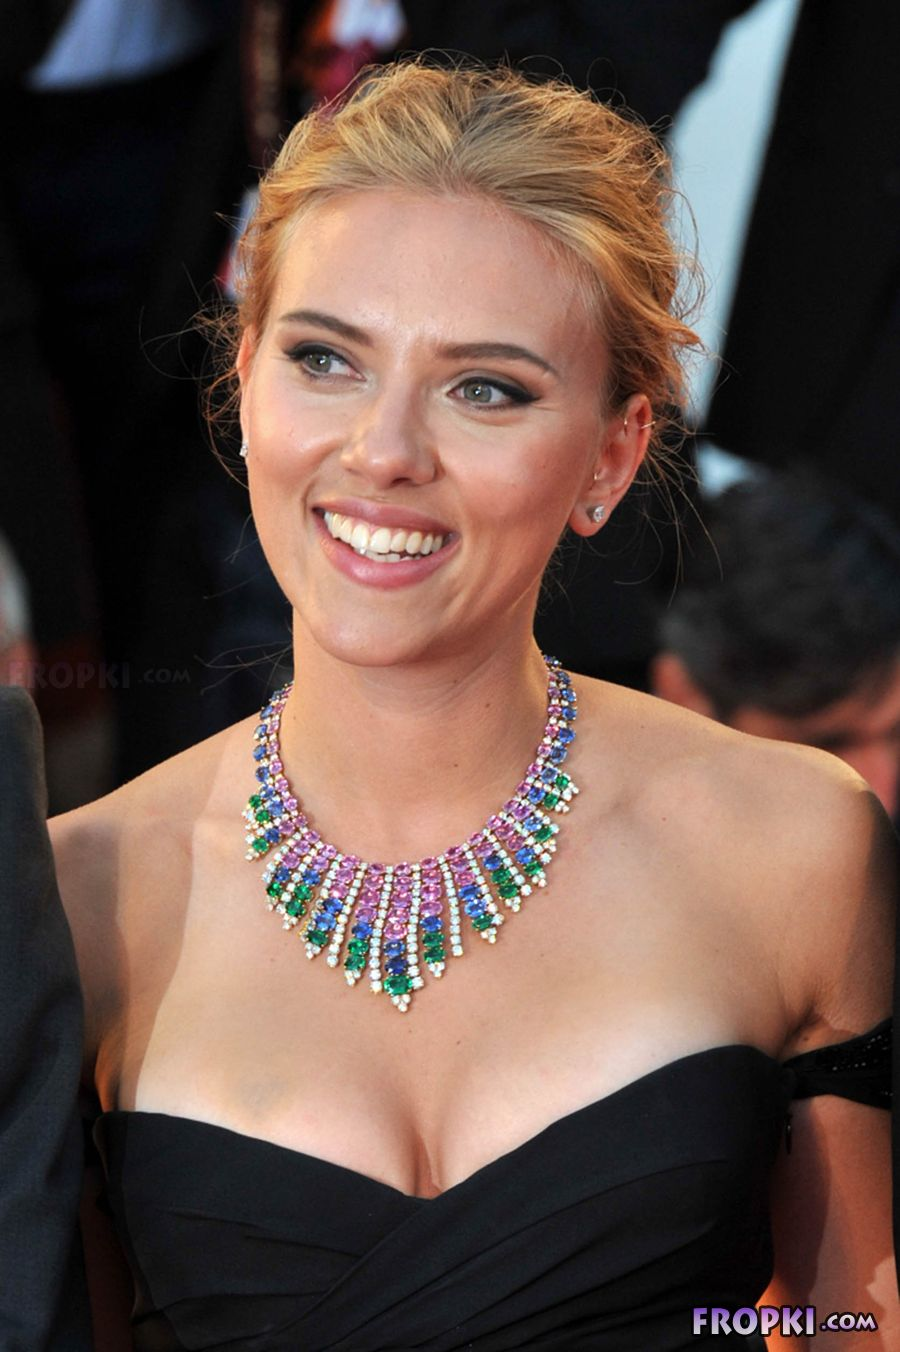 Scarlett Johansson Fropki 06